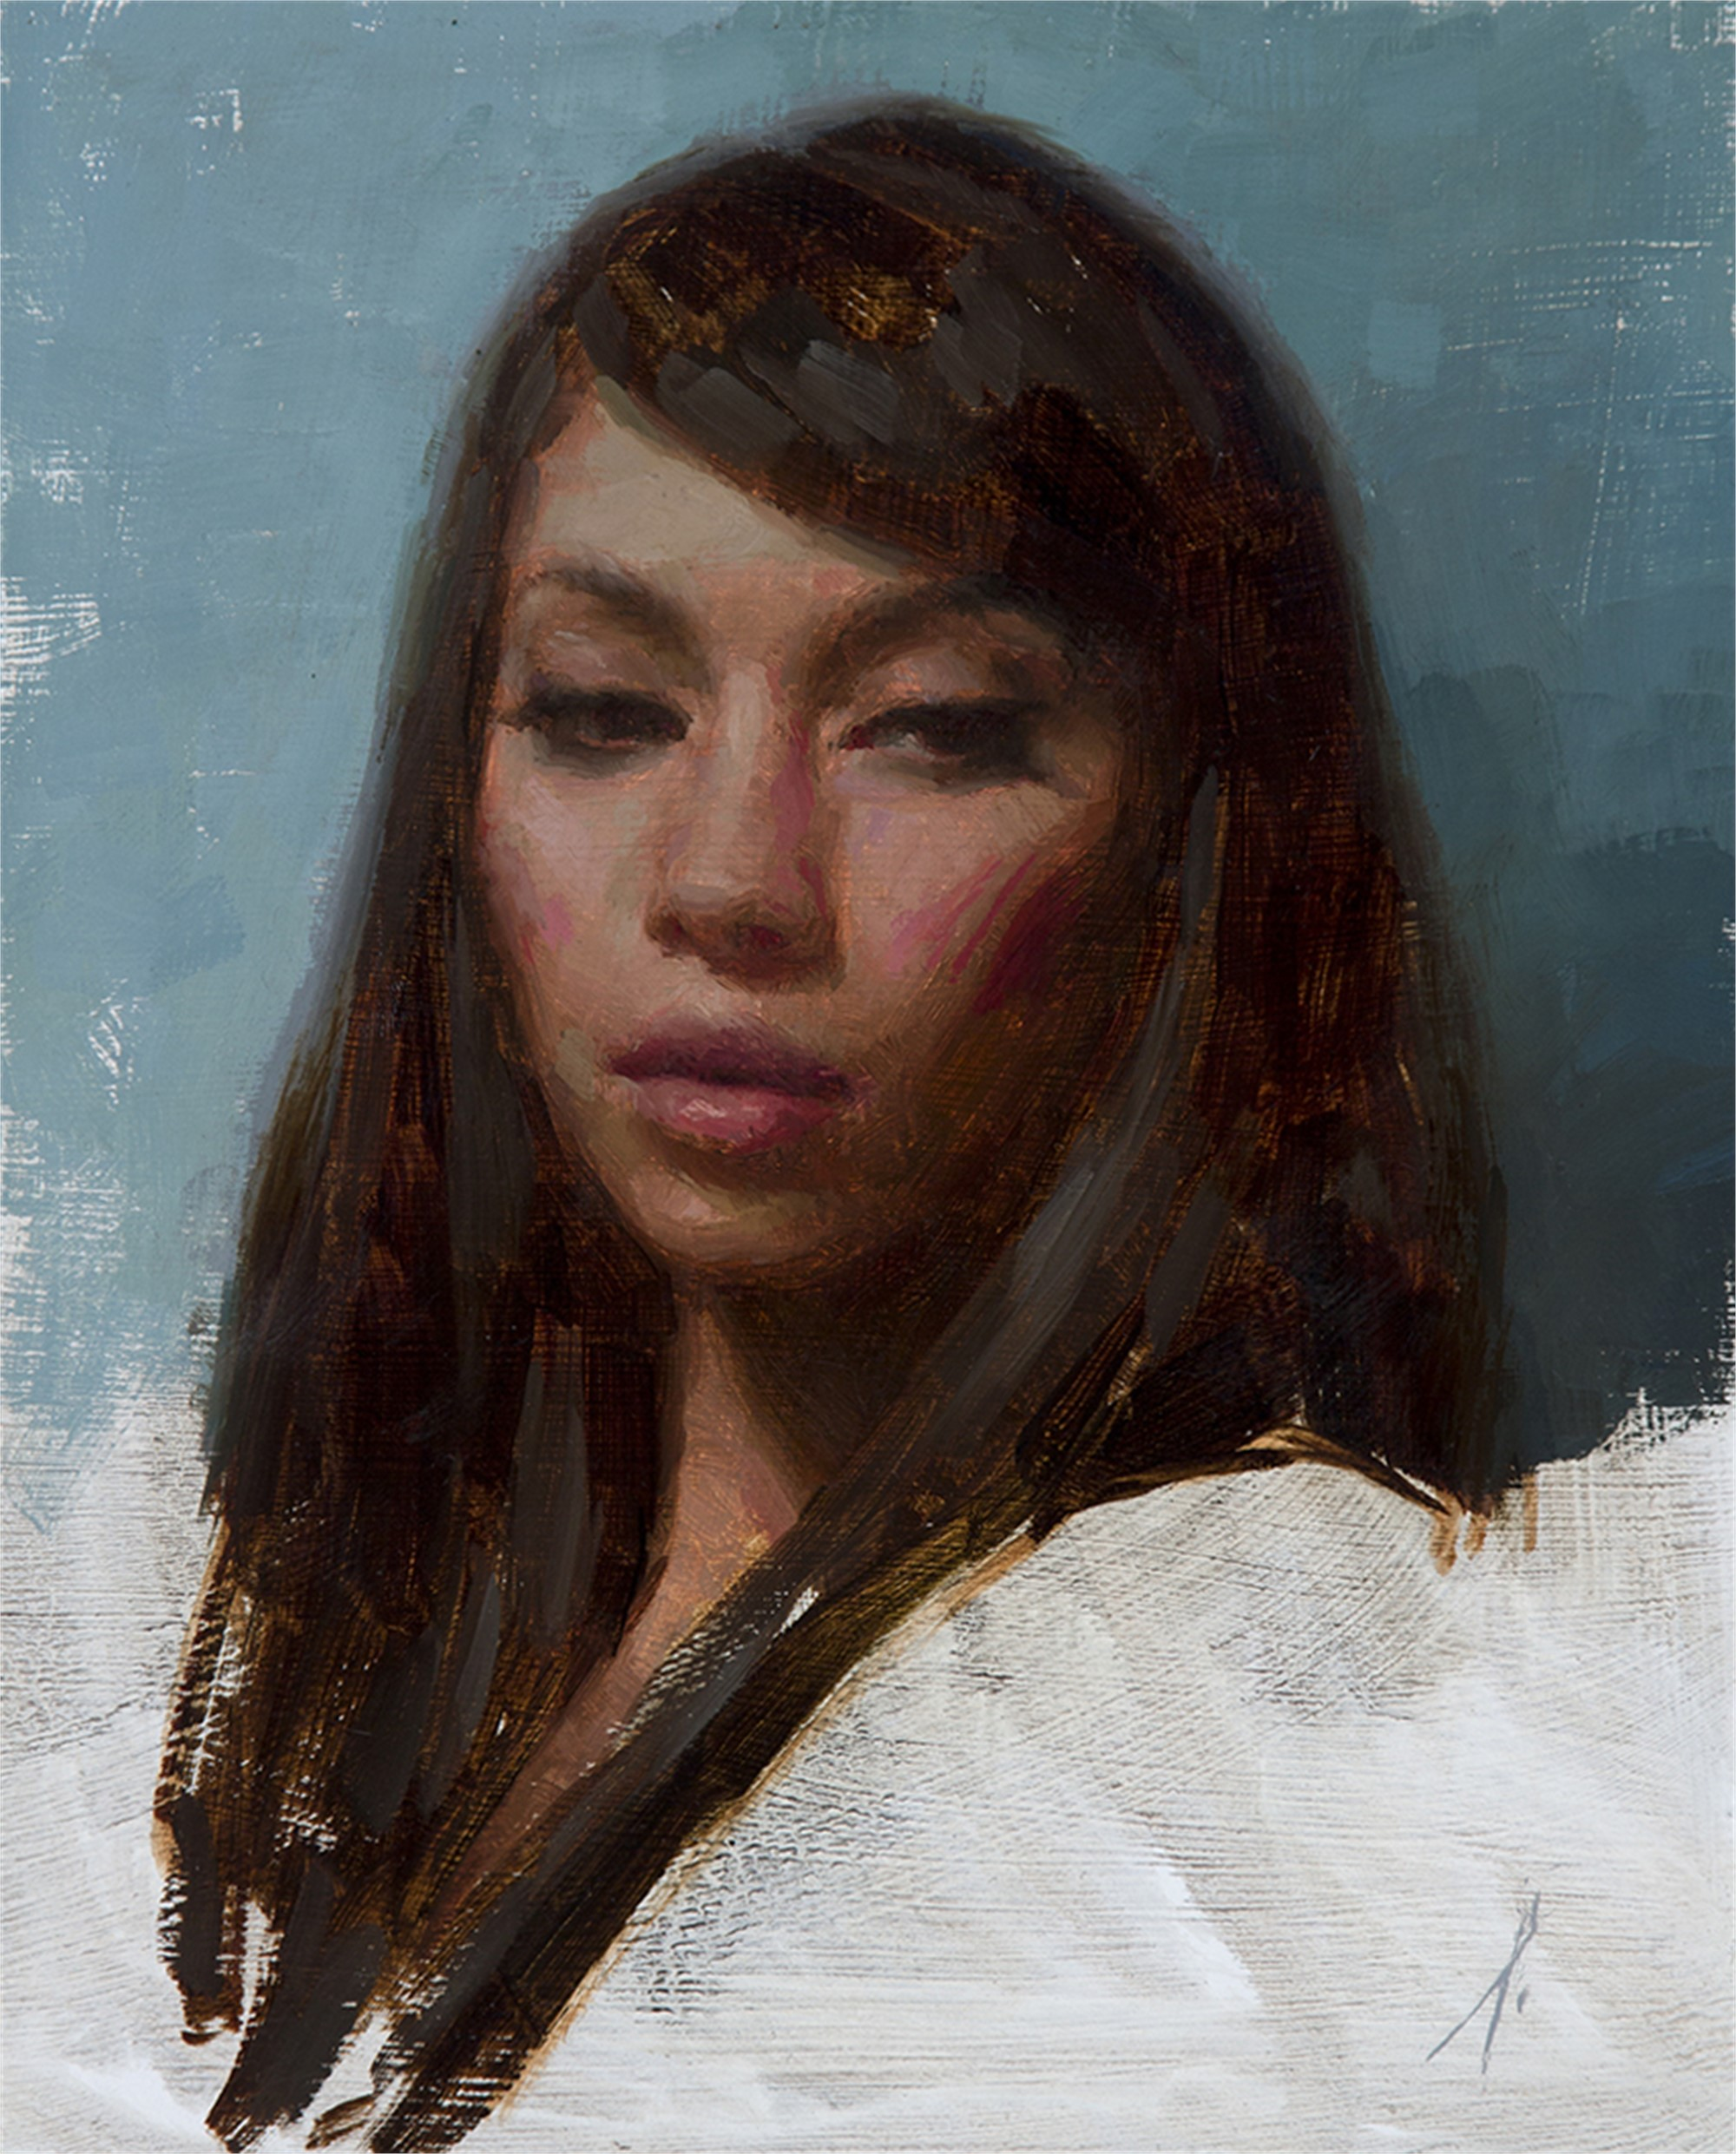 Portrait of a Young Woman by Mark Bradley Schwartz